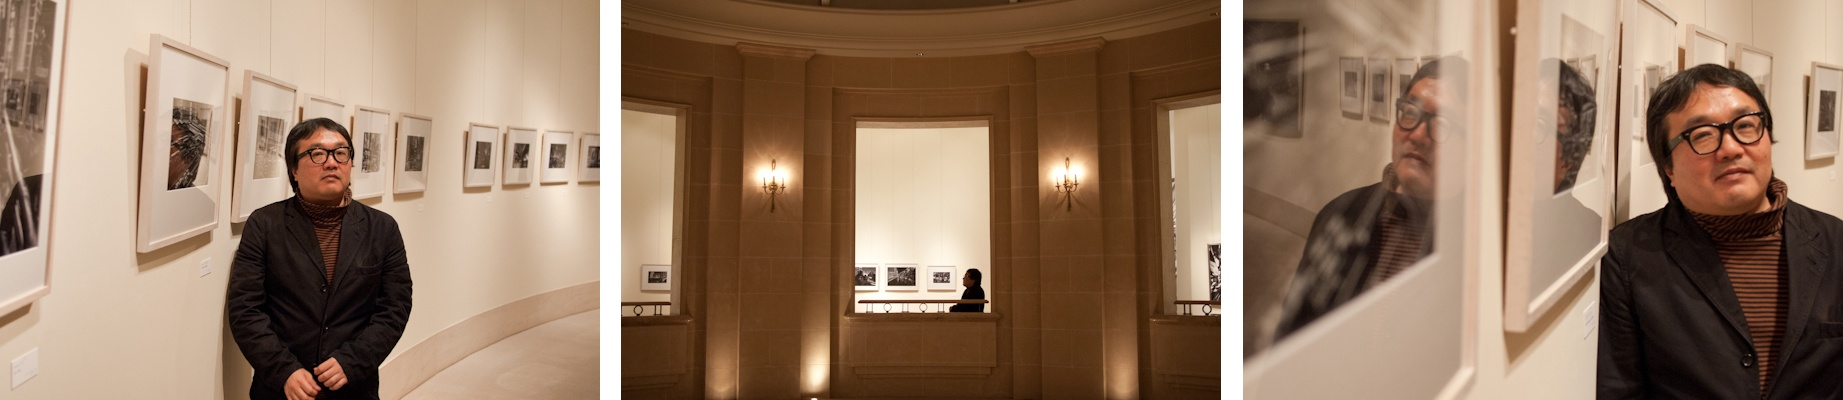 <b>2010年、所幸則写真展「PARADOX」GALLERY 21にて</b>